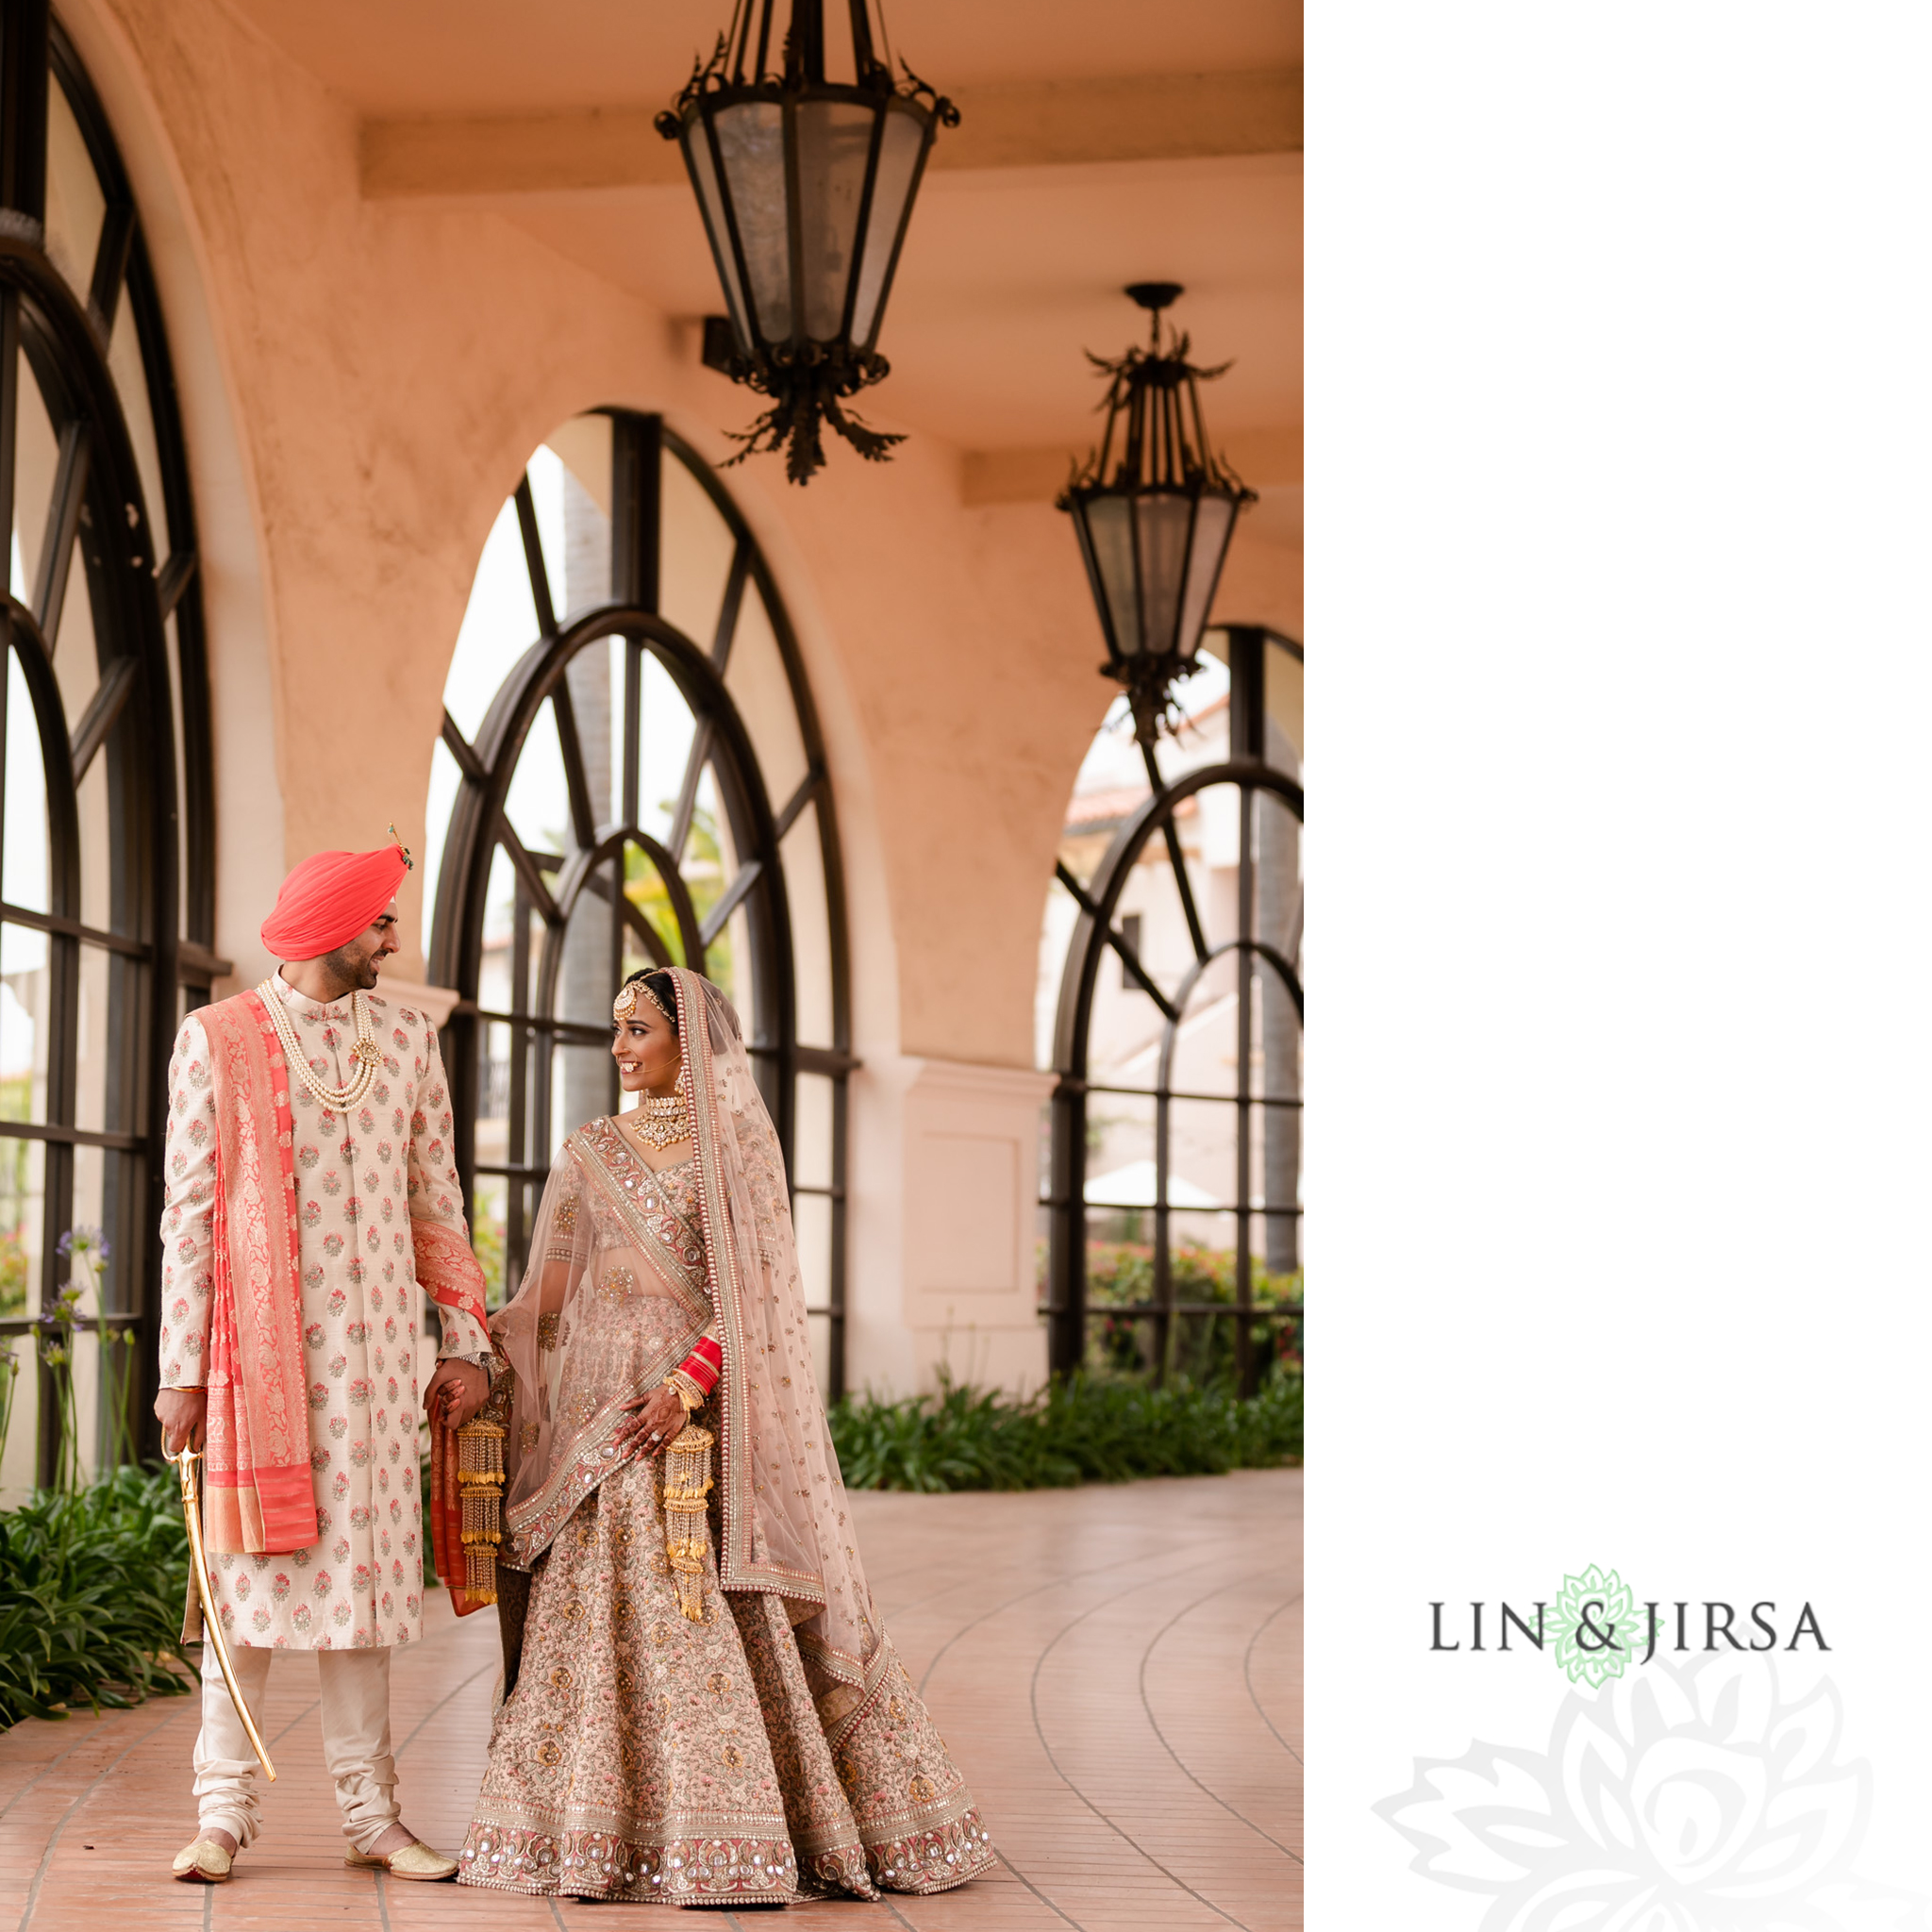 29 Hilton Santa Barbara Beachfront Resort Punjabi Indian Wedding Ceremony Photography